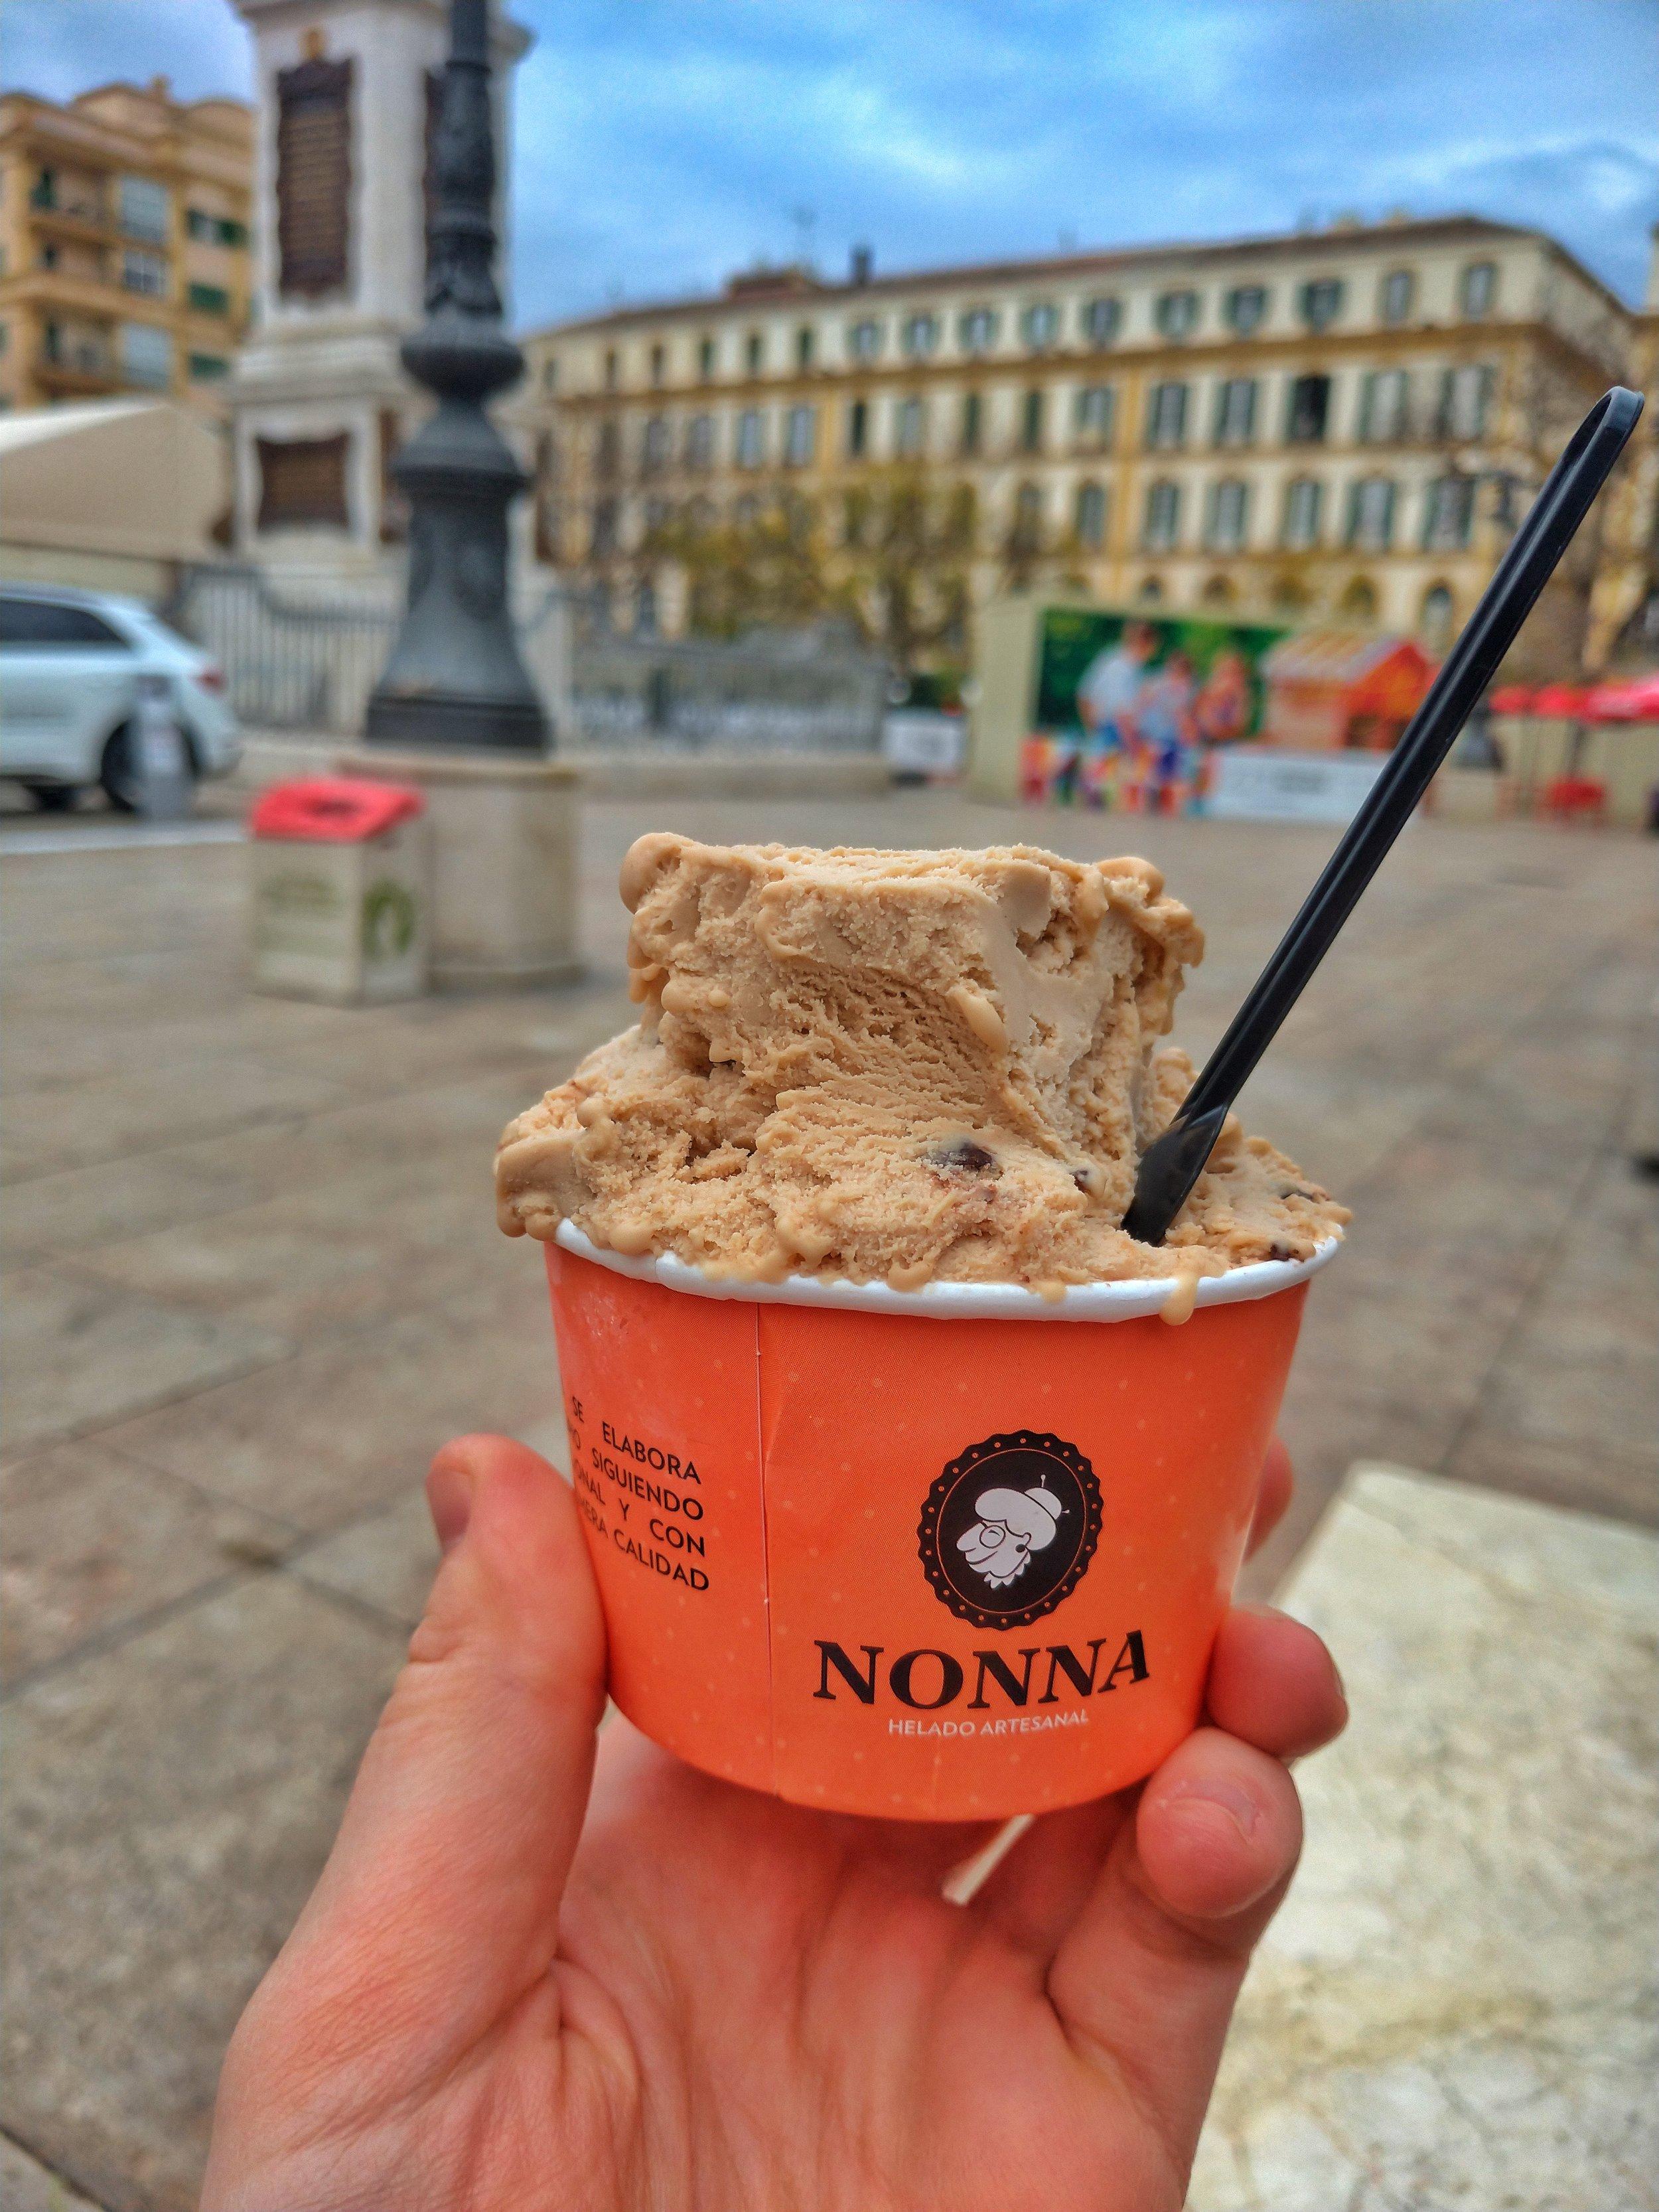 Vegan Hazelnut Ice Cream from NONNA helado artesanal